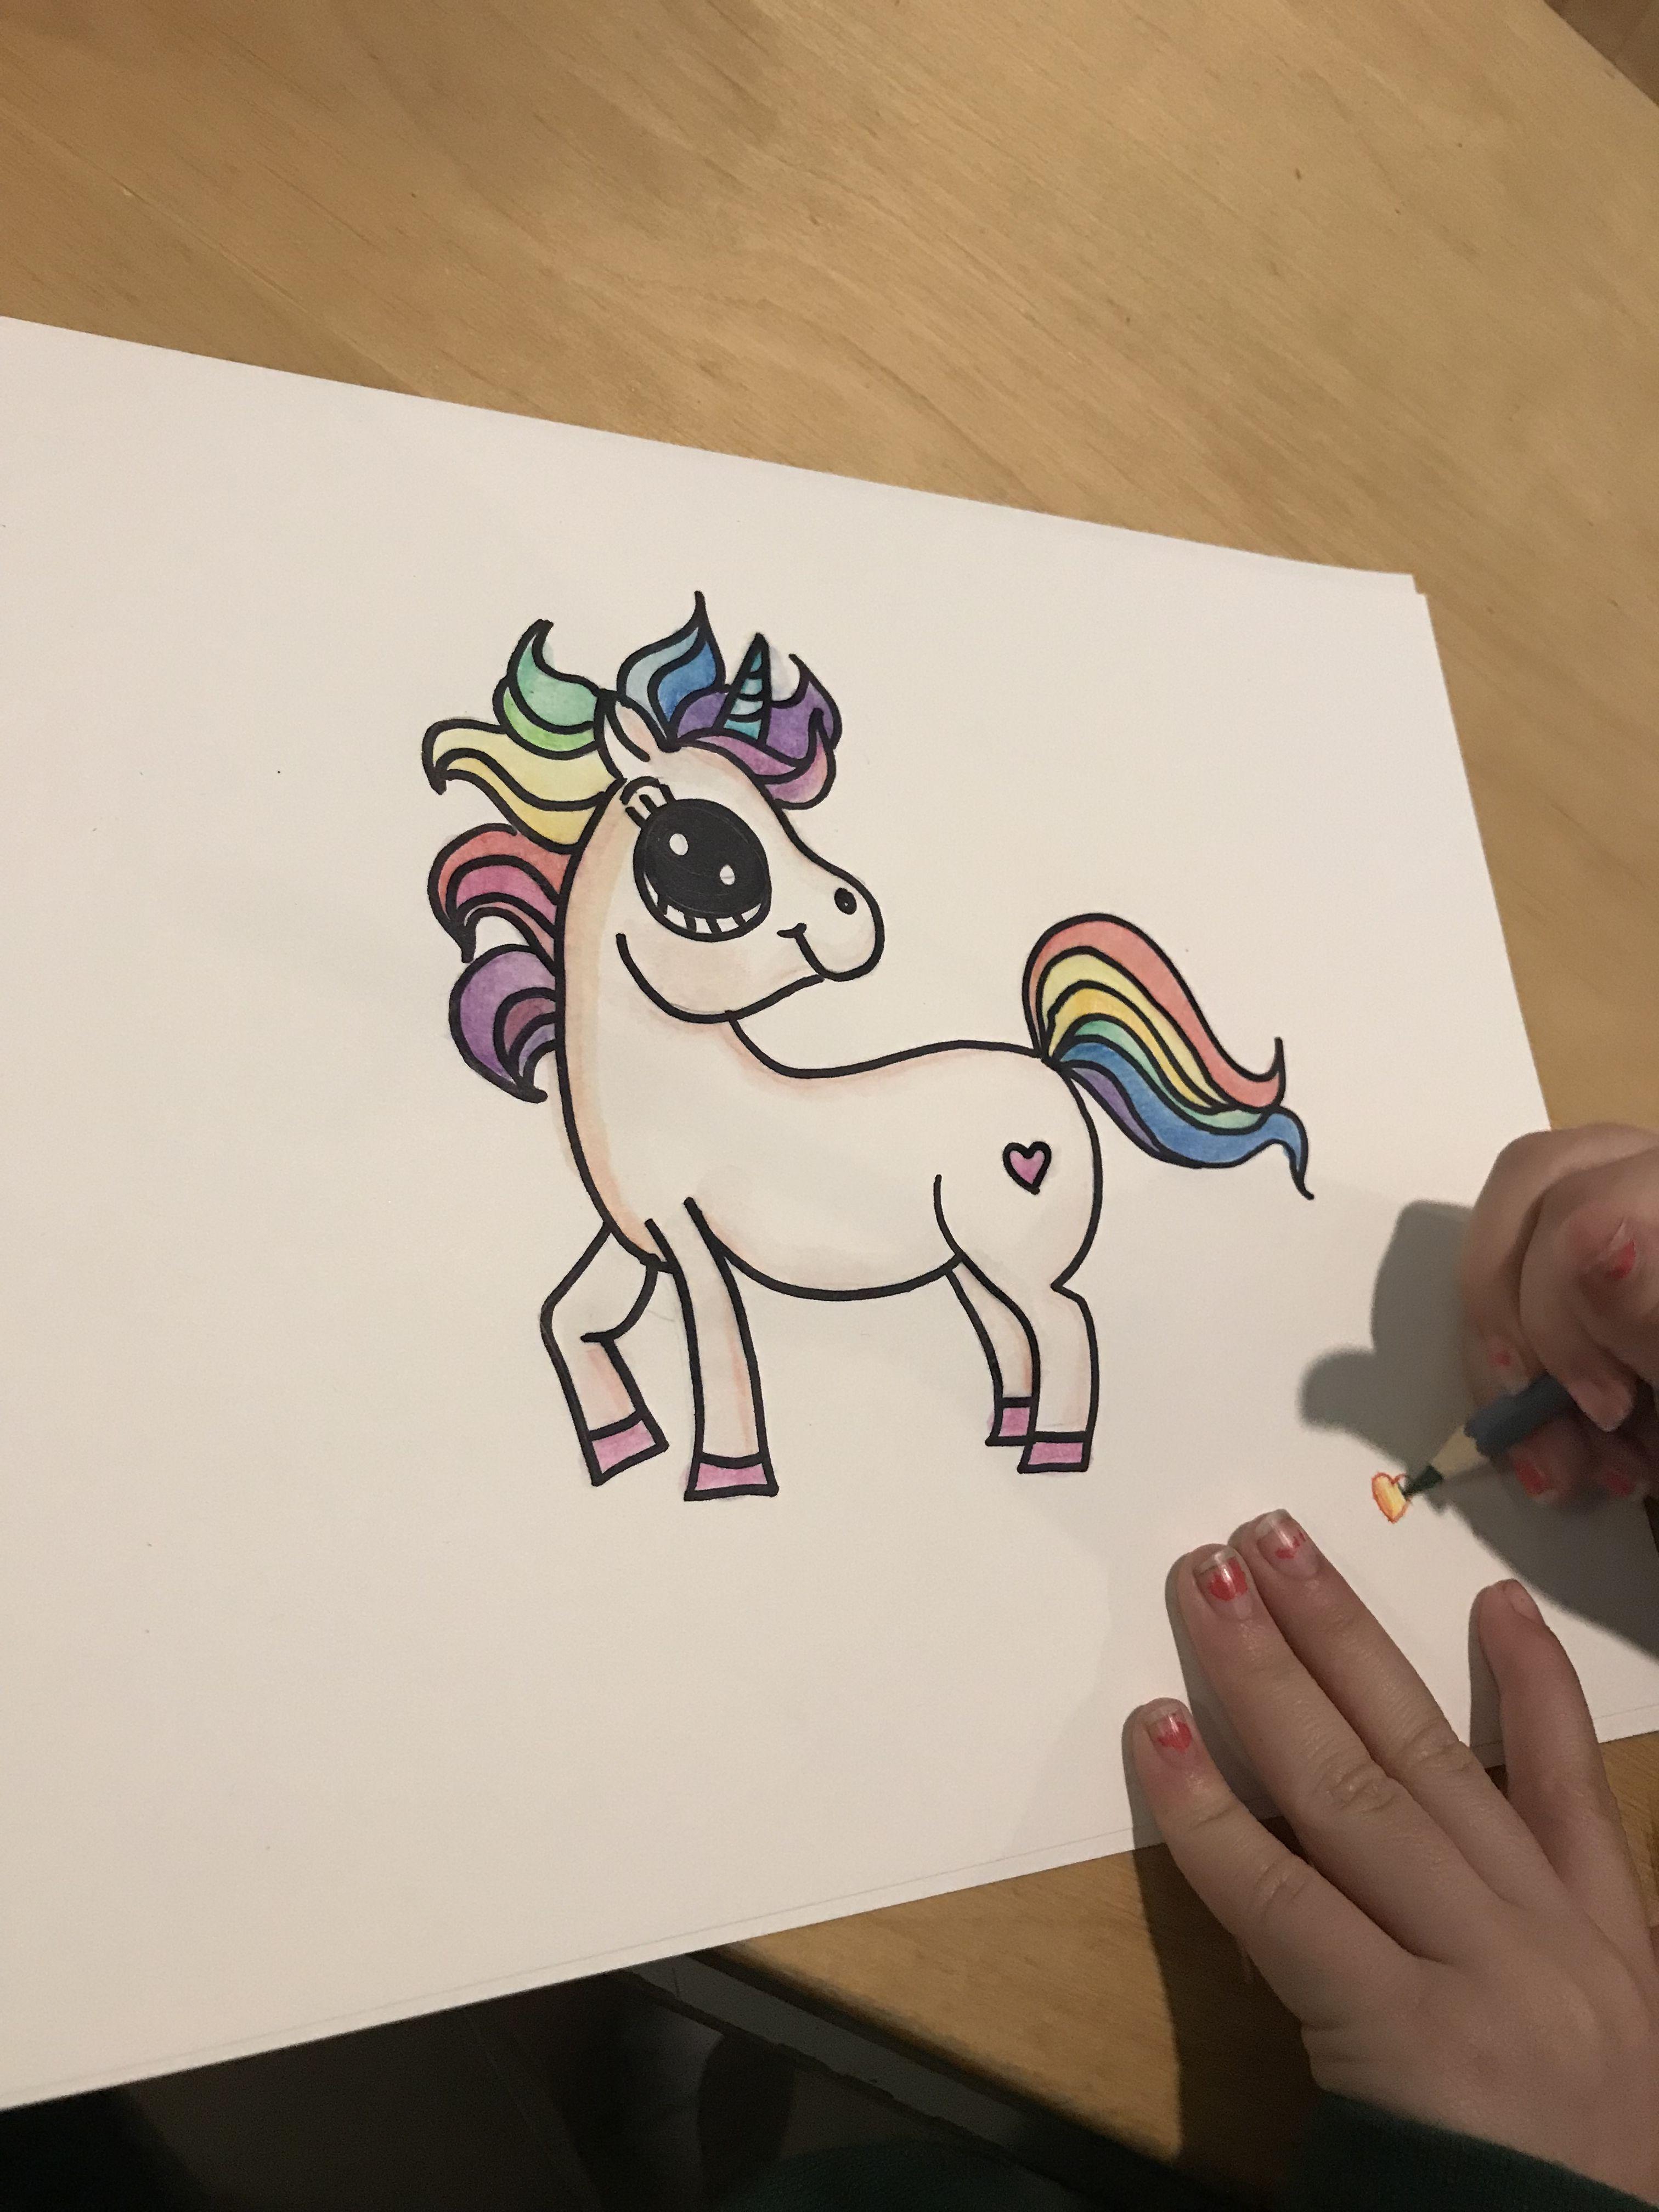 Draw So Cute Unicorn Unicorn Drawing Cute Drawings Cute Unicorn